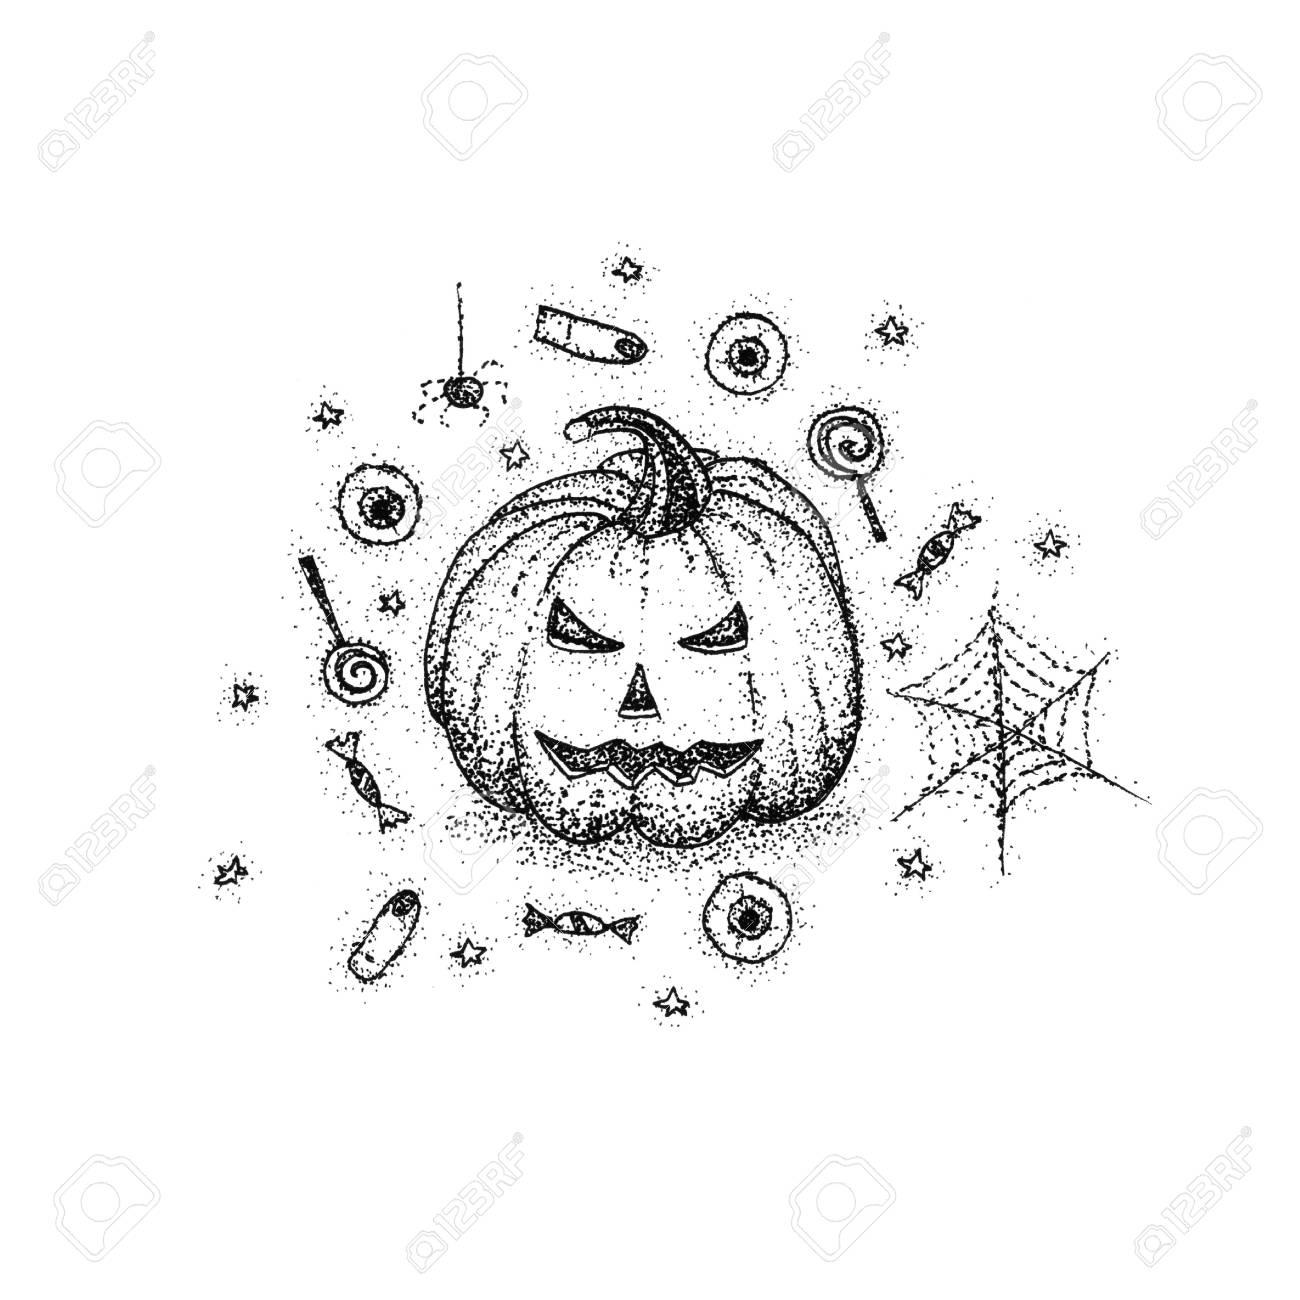 1300x1300 Halloween Pumpkin Dotwork. Raster Illustration Of Creepy Concept